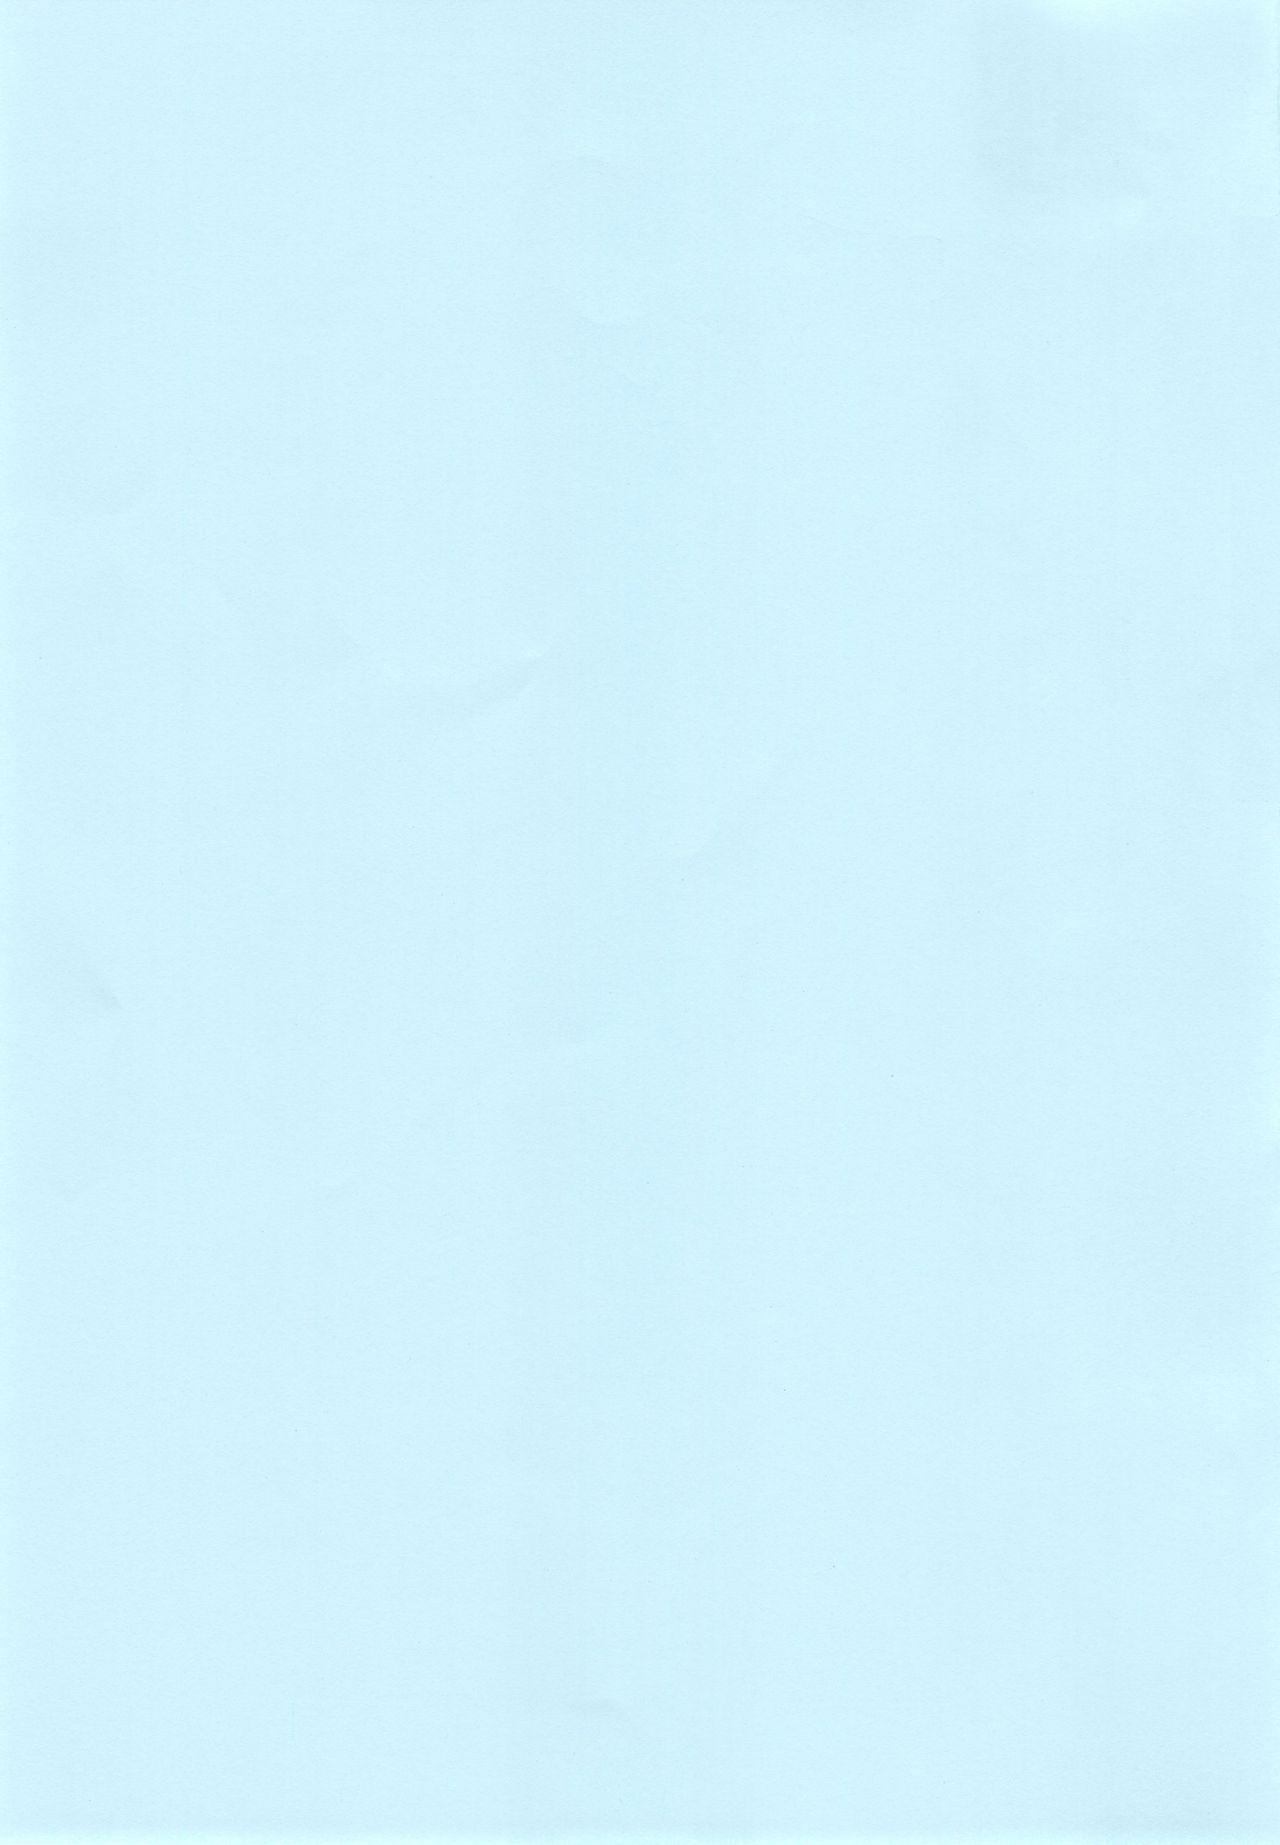 BREAK BLUE MARRON SPARRING 2